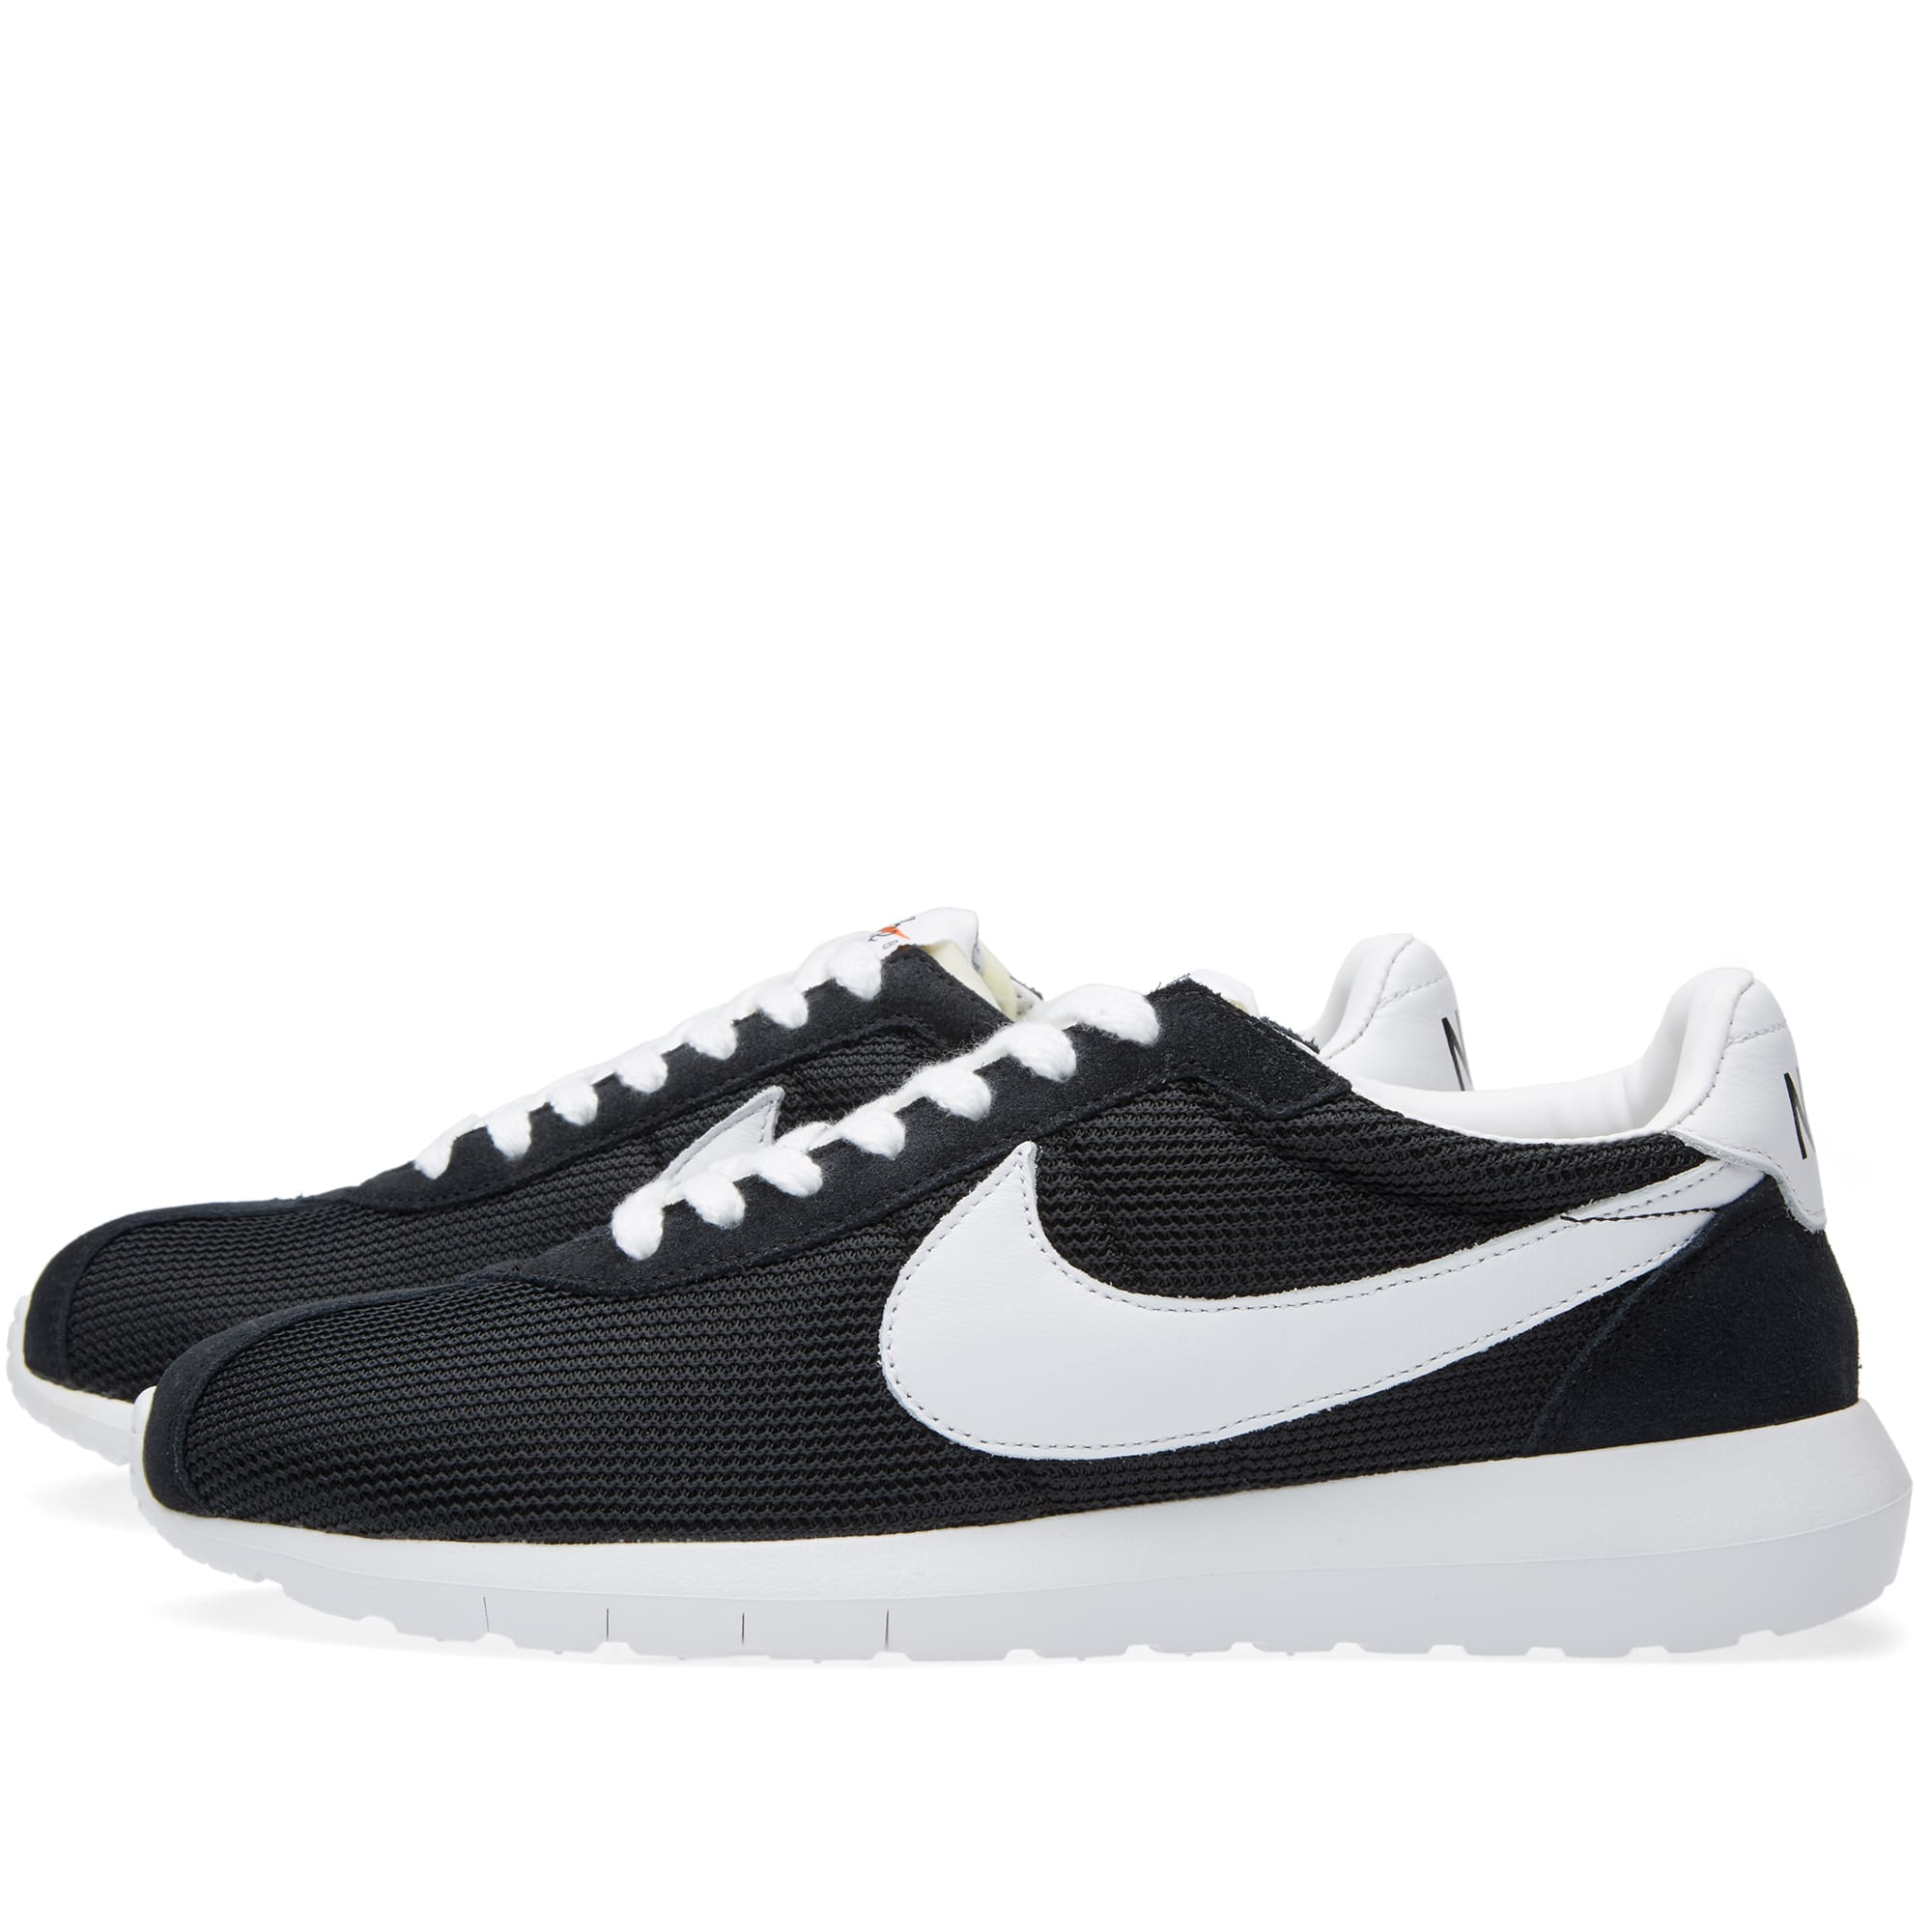 promo code 11689 73a0a Nike Roshe LD-1000 QS Black   White   END.